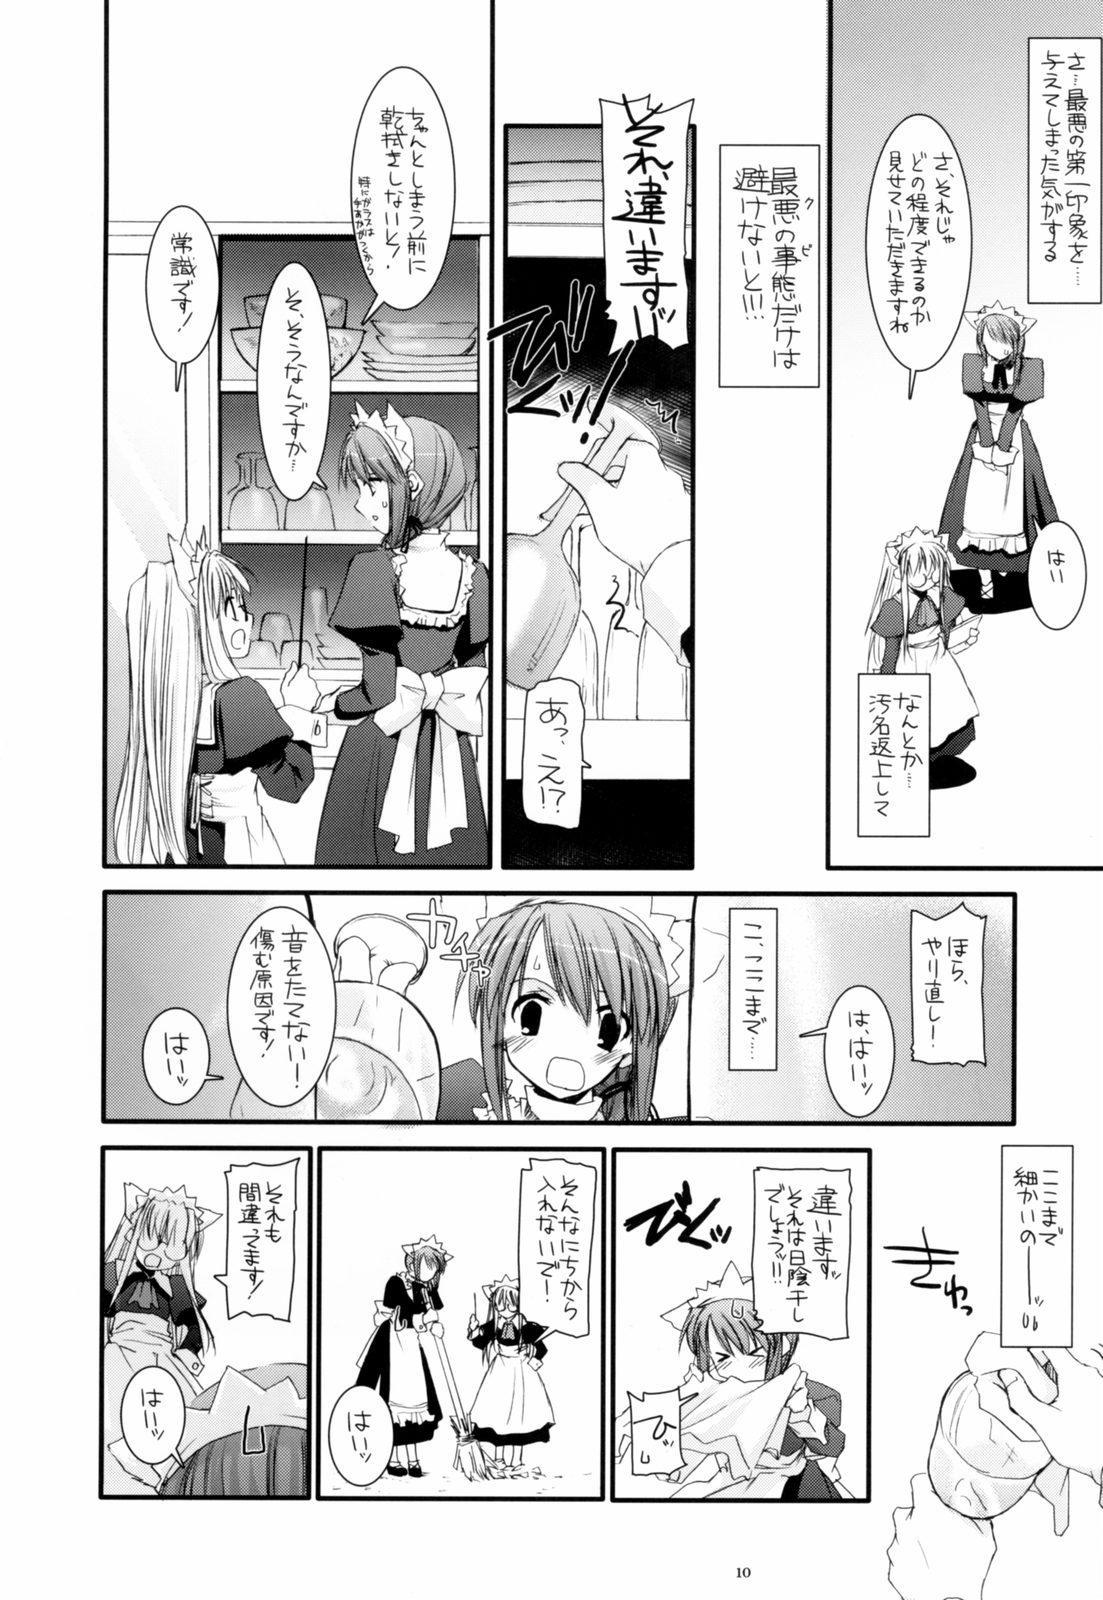 Seifuku Rakuen 13 - Costume Paradise 13 8